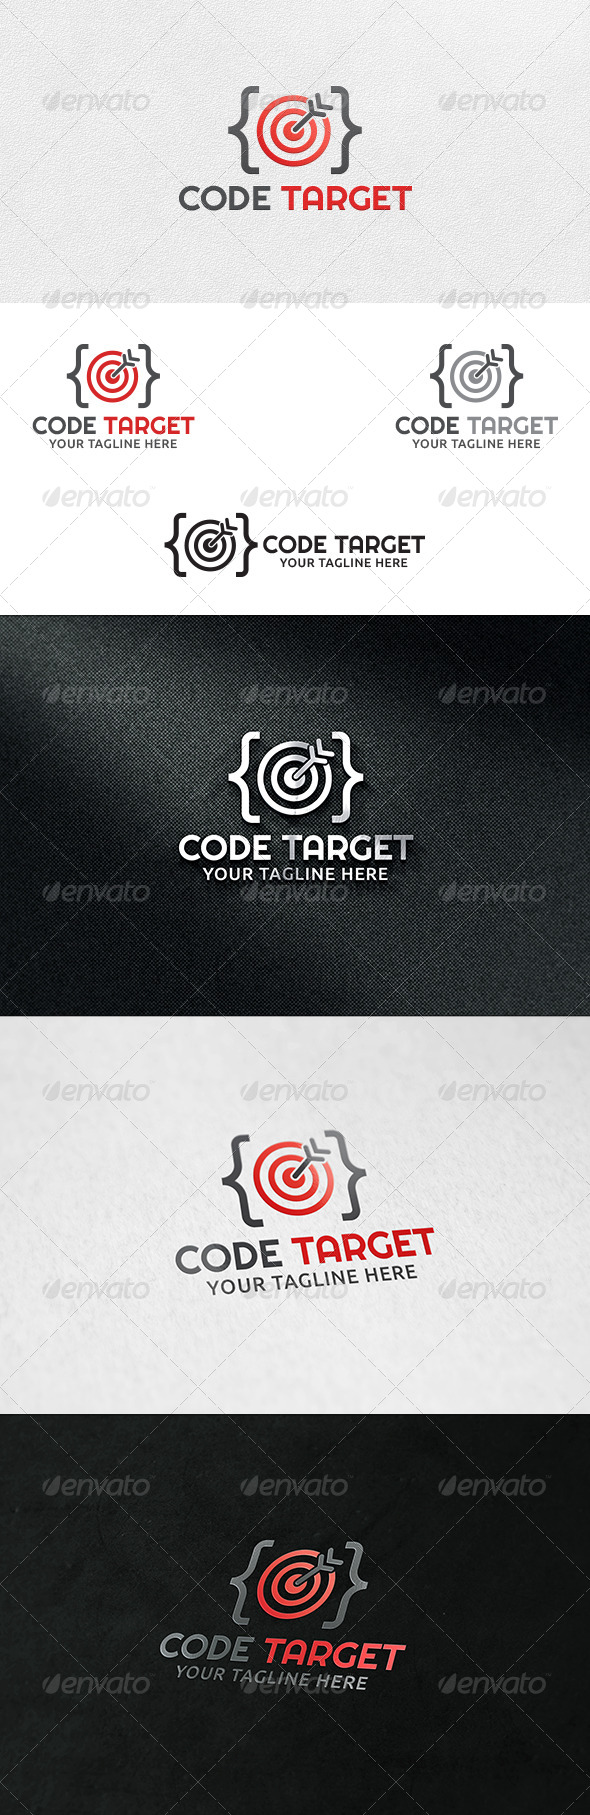 Code Target - Logo Template - Symbols Logo Templates